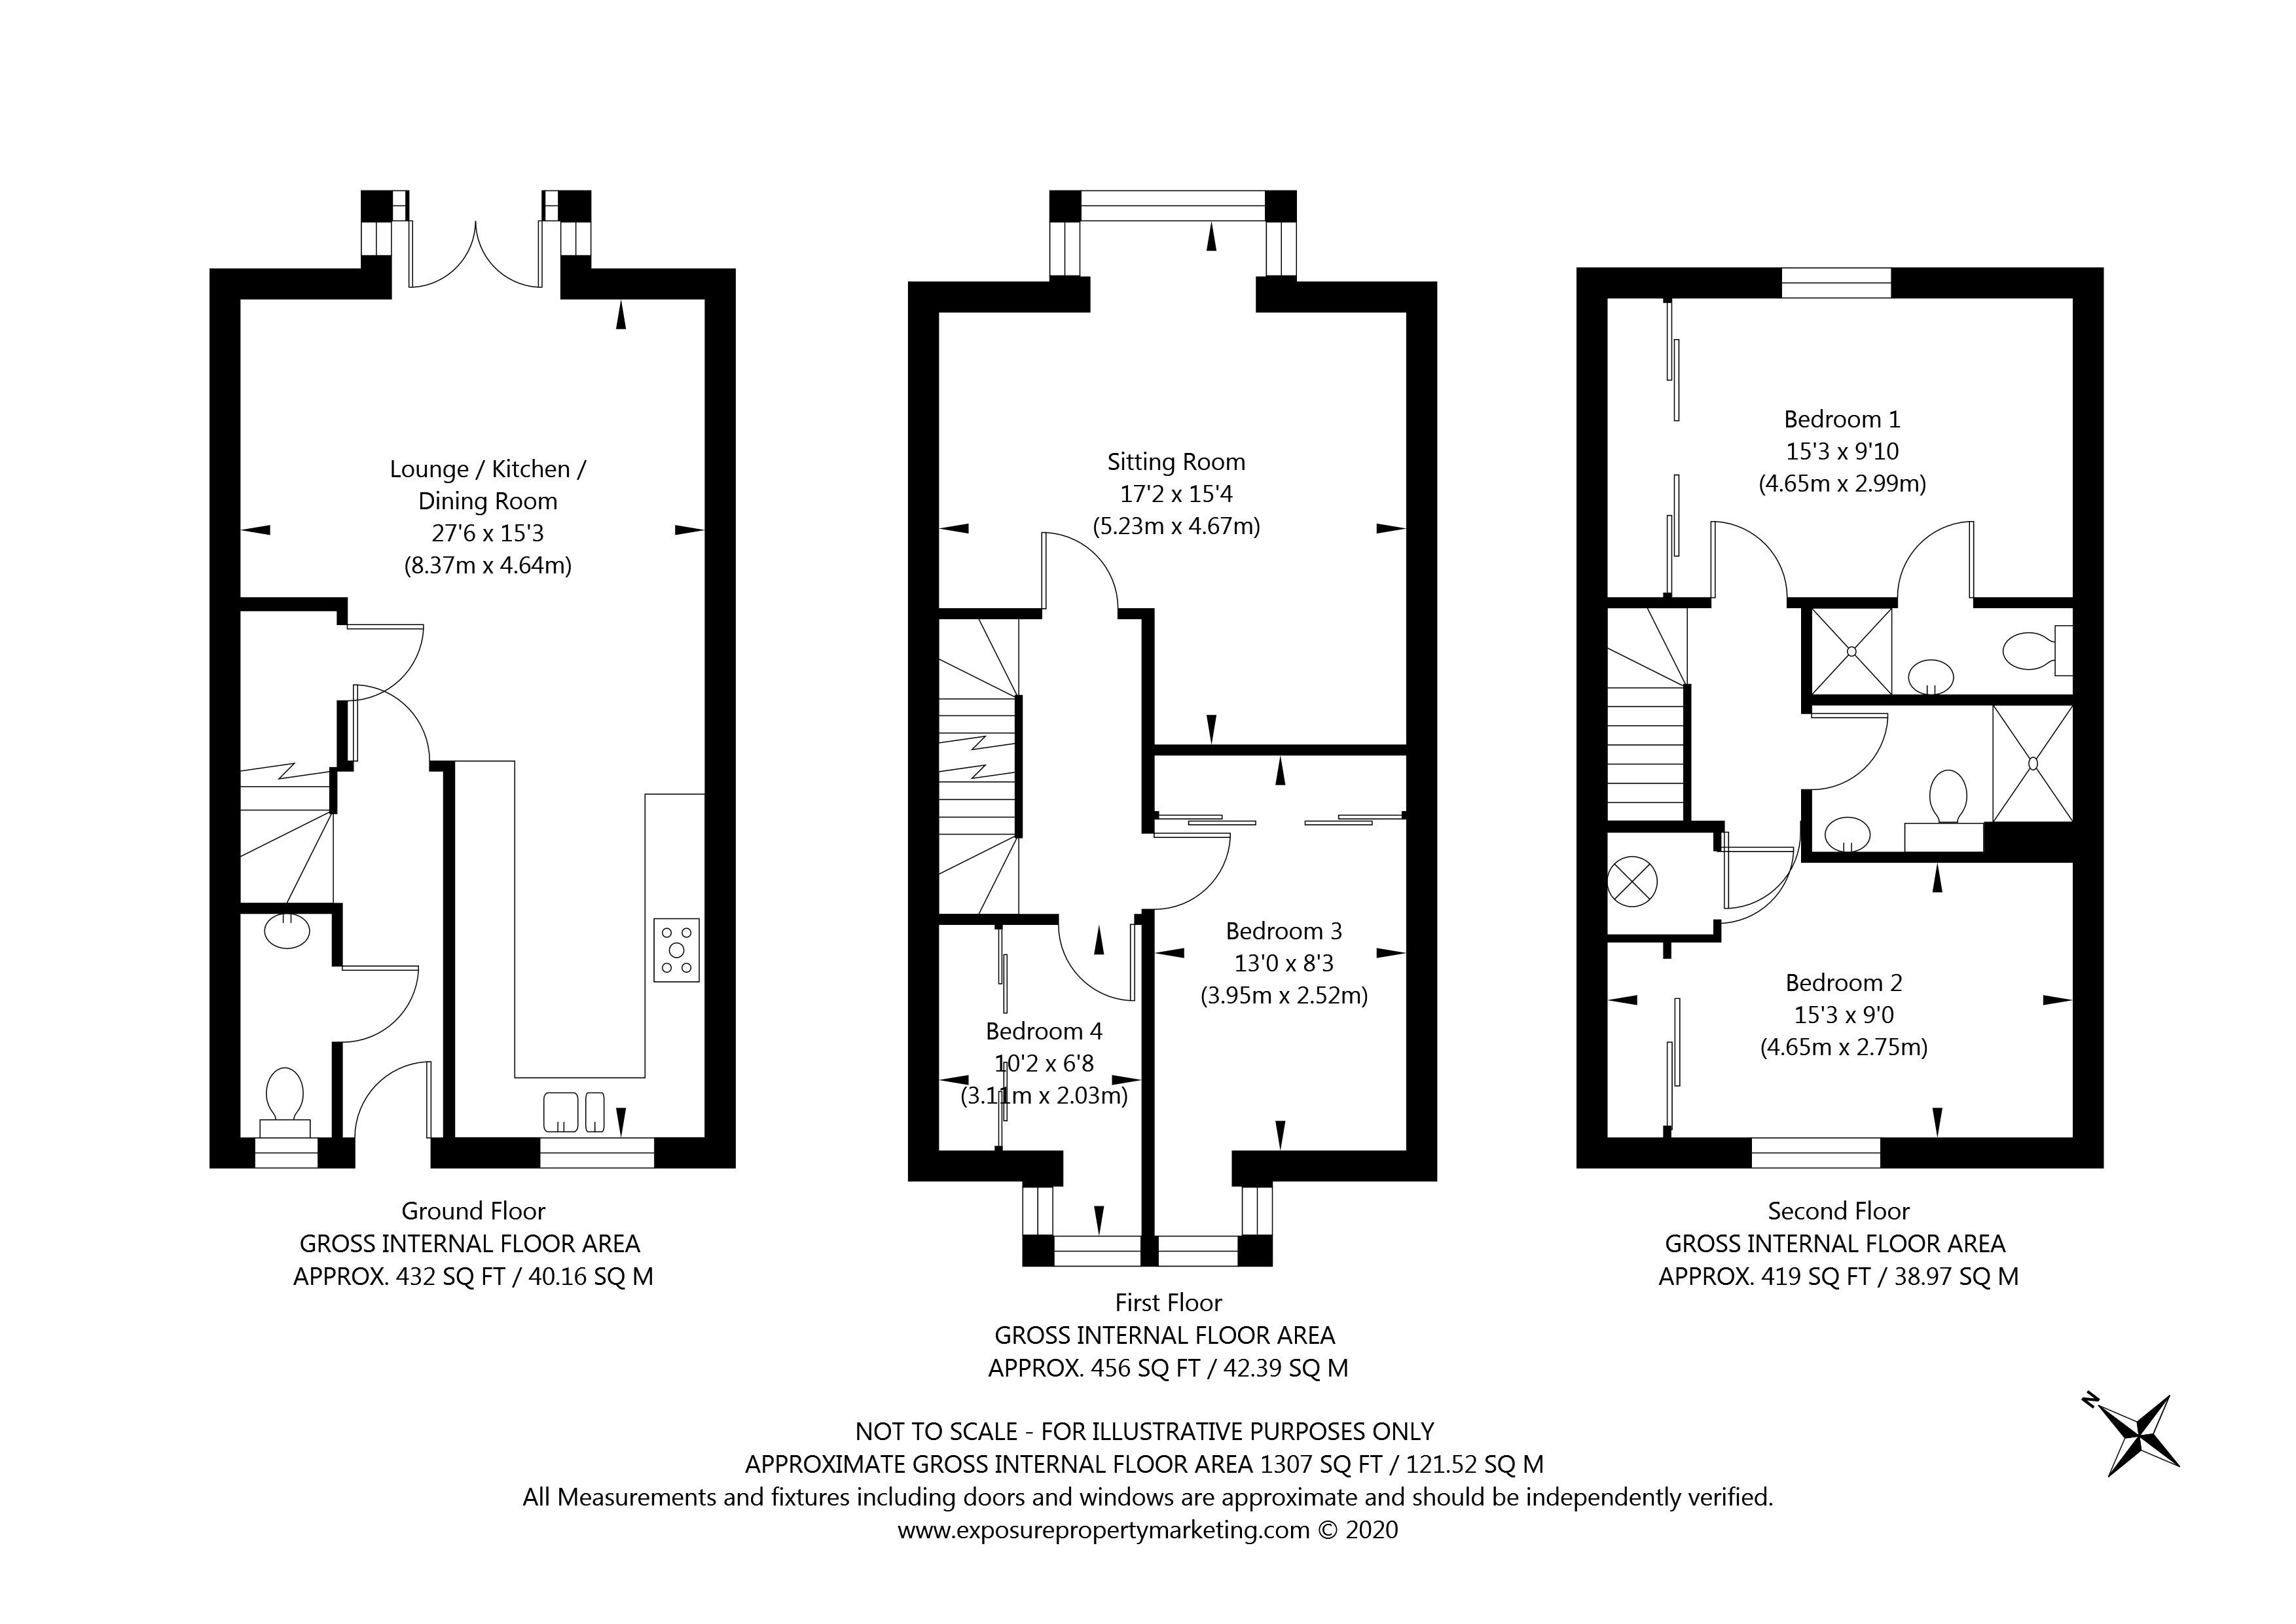 St Johns Walk, York property floorplan